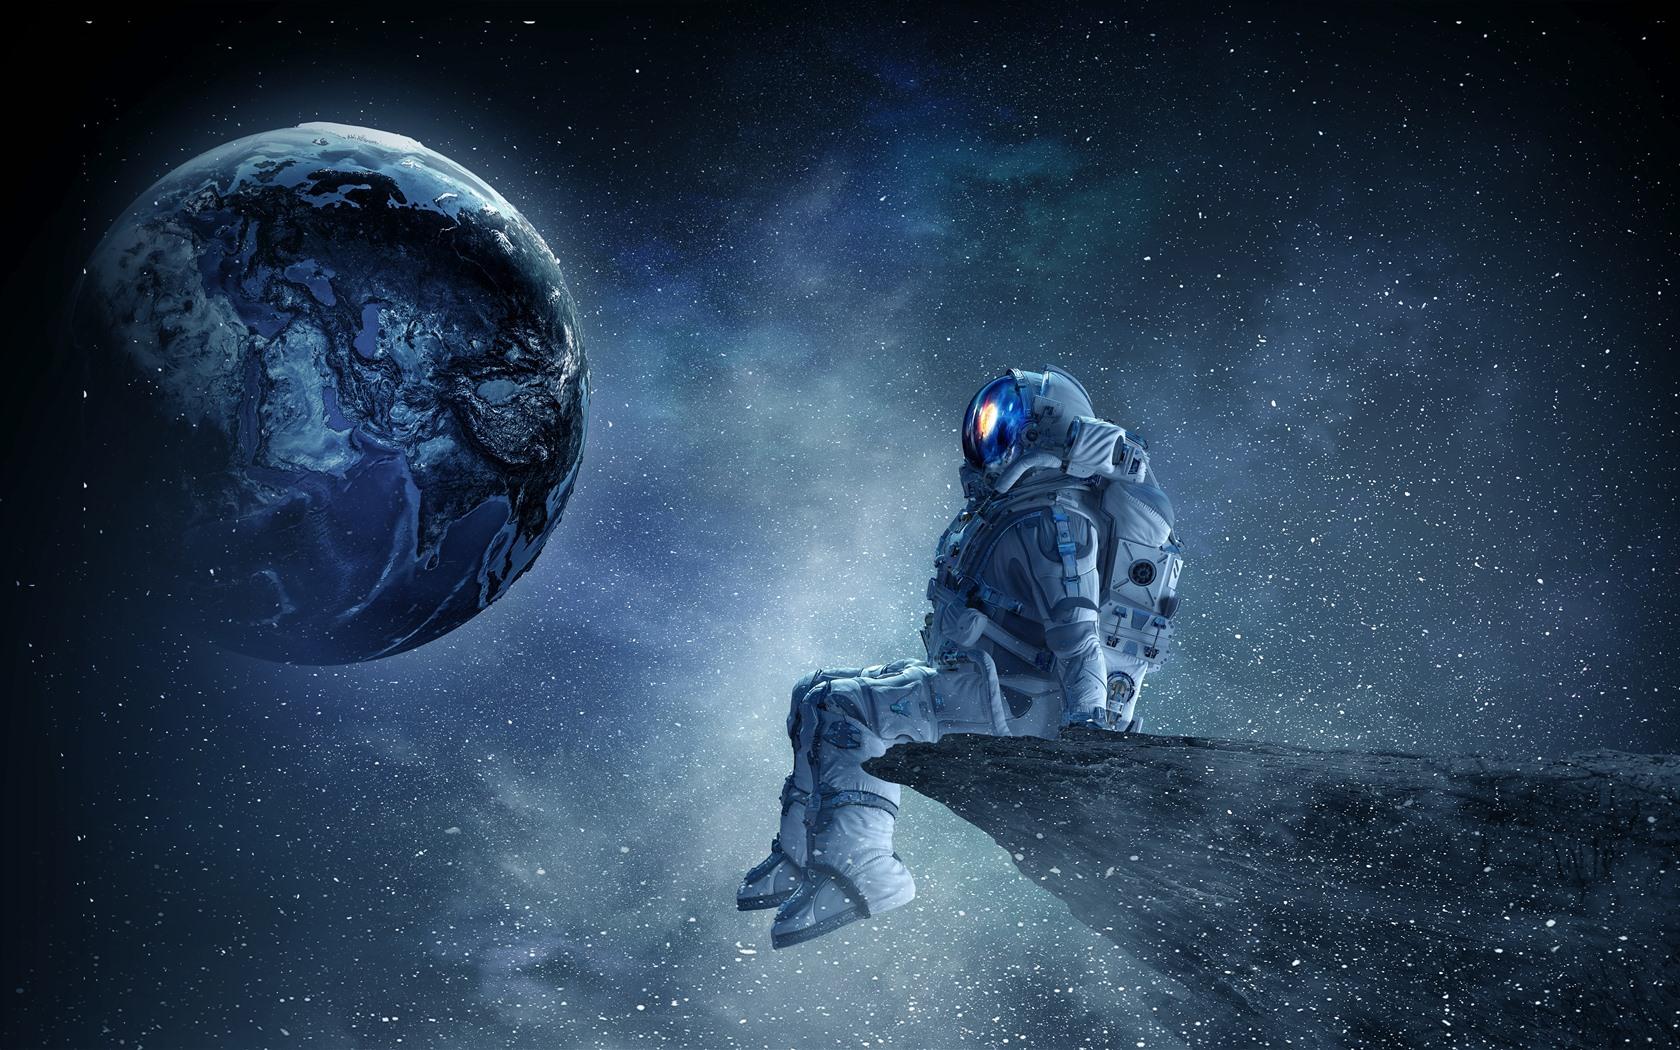 Fondos De Pantalla Astronauta, Planeta, Estrellas, Hermoso